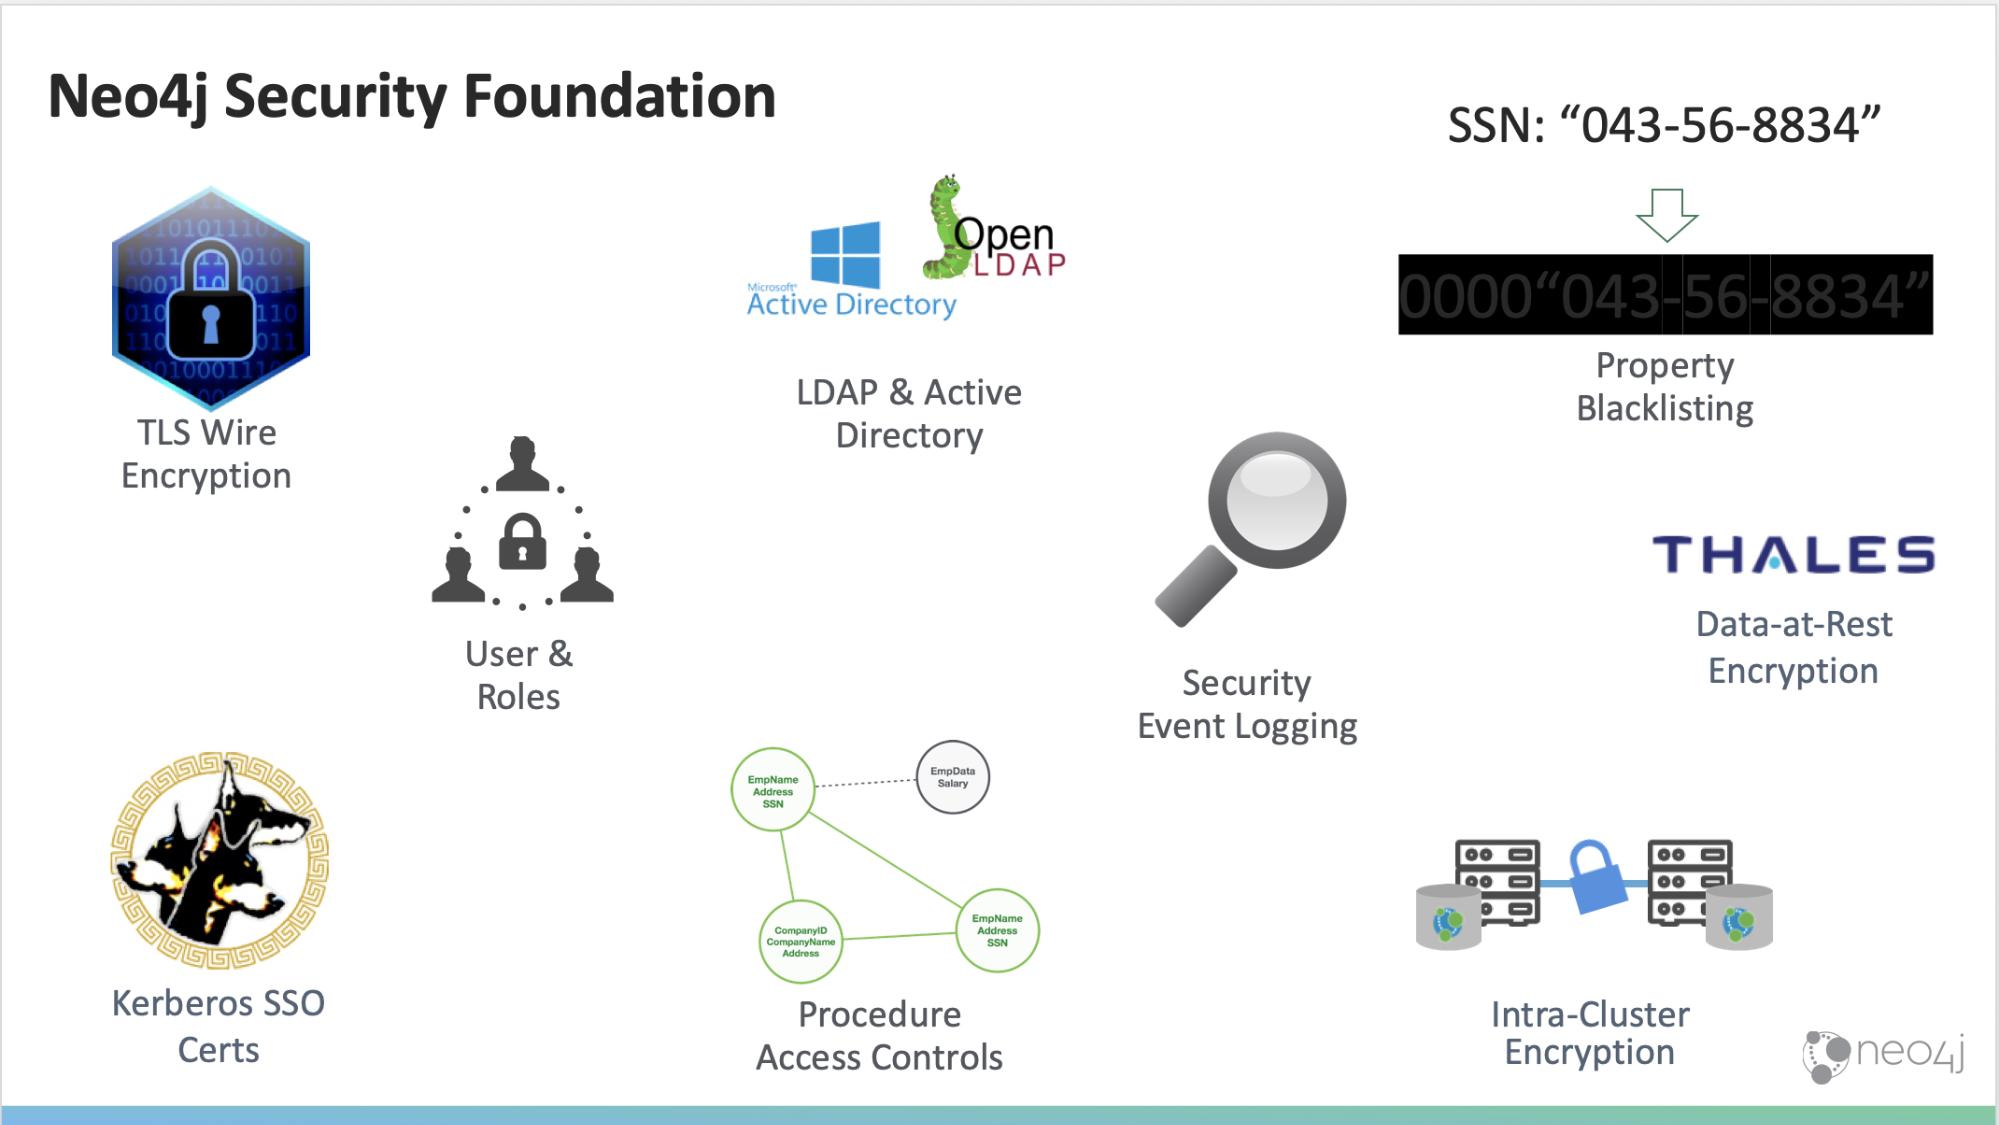 Neo4j Security Foundation